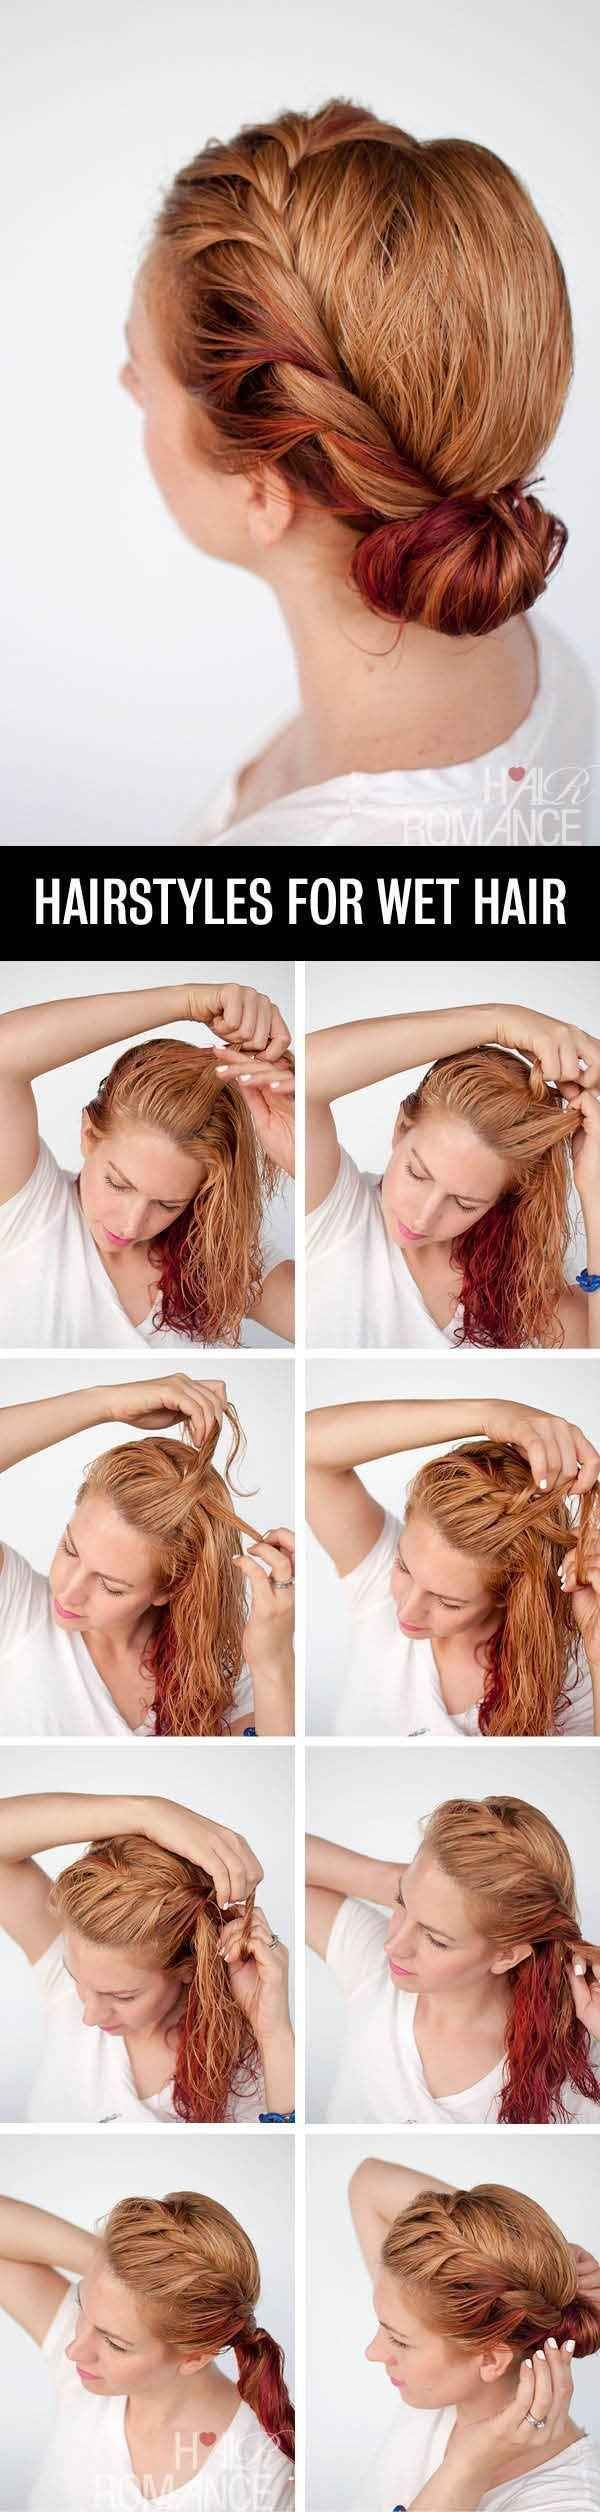 Pretty Braided Crown Hairstyle Tutorials and Ideas / http://www.himisspuff.com/easy-diy-braided-hairstyles-tutorials/25/